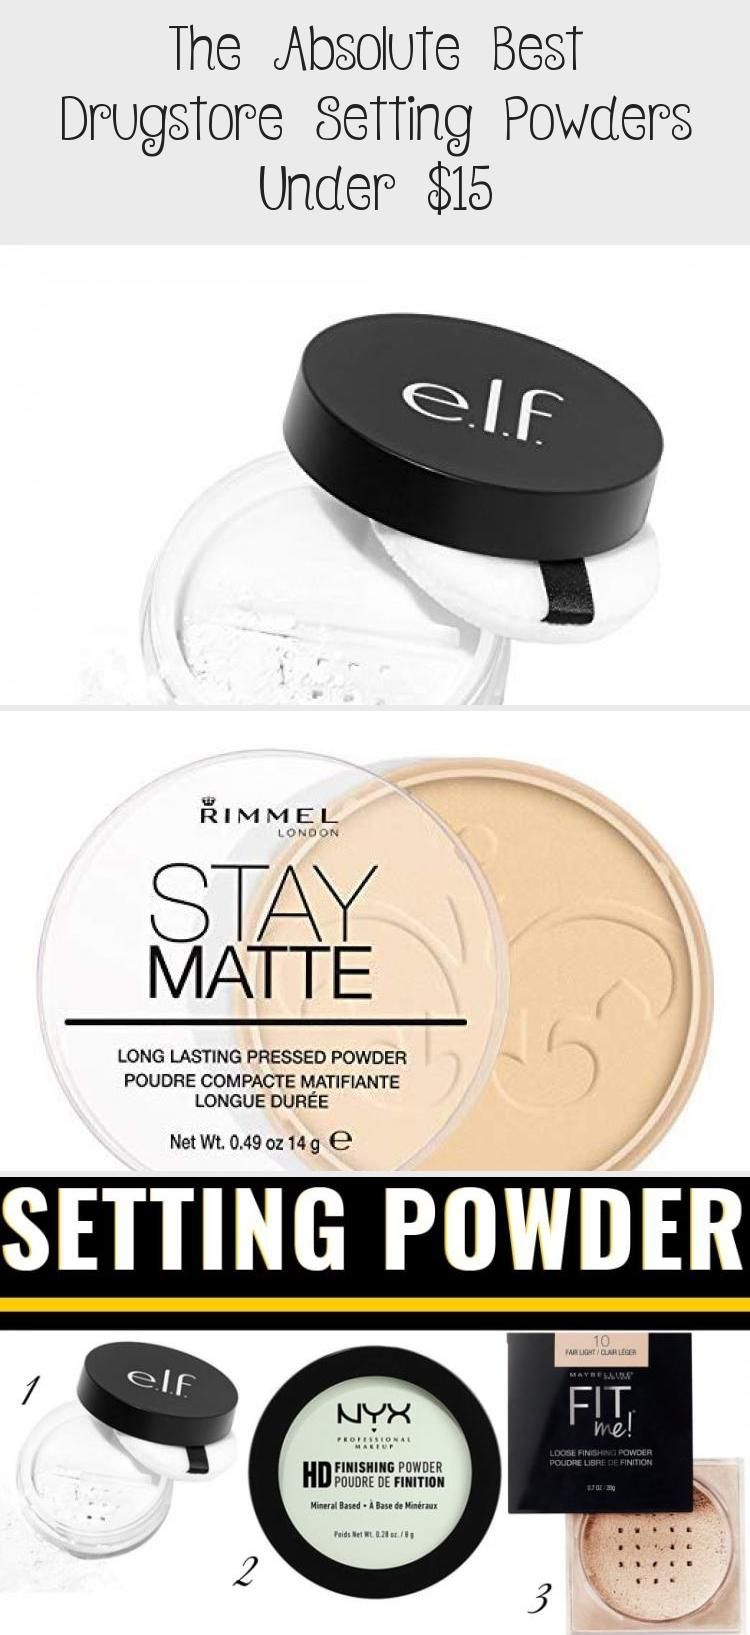 Makeup in 2020 Best drugstore setting powder, Setting